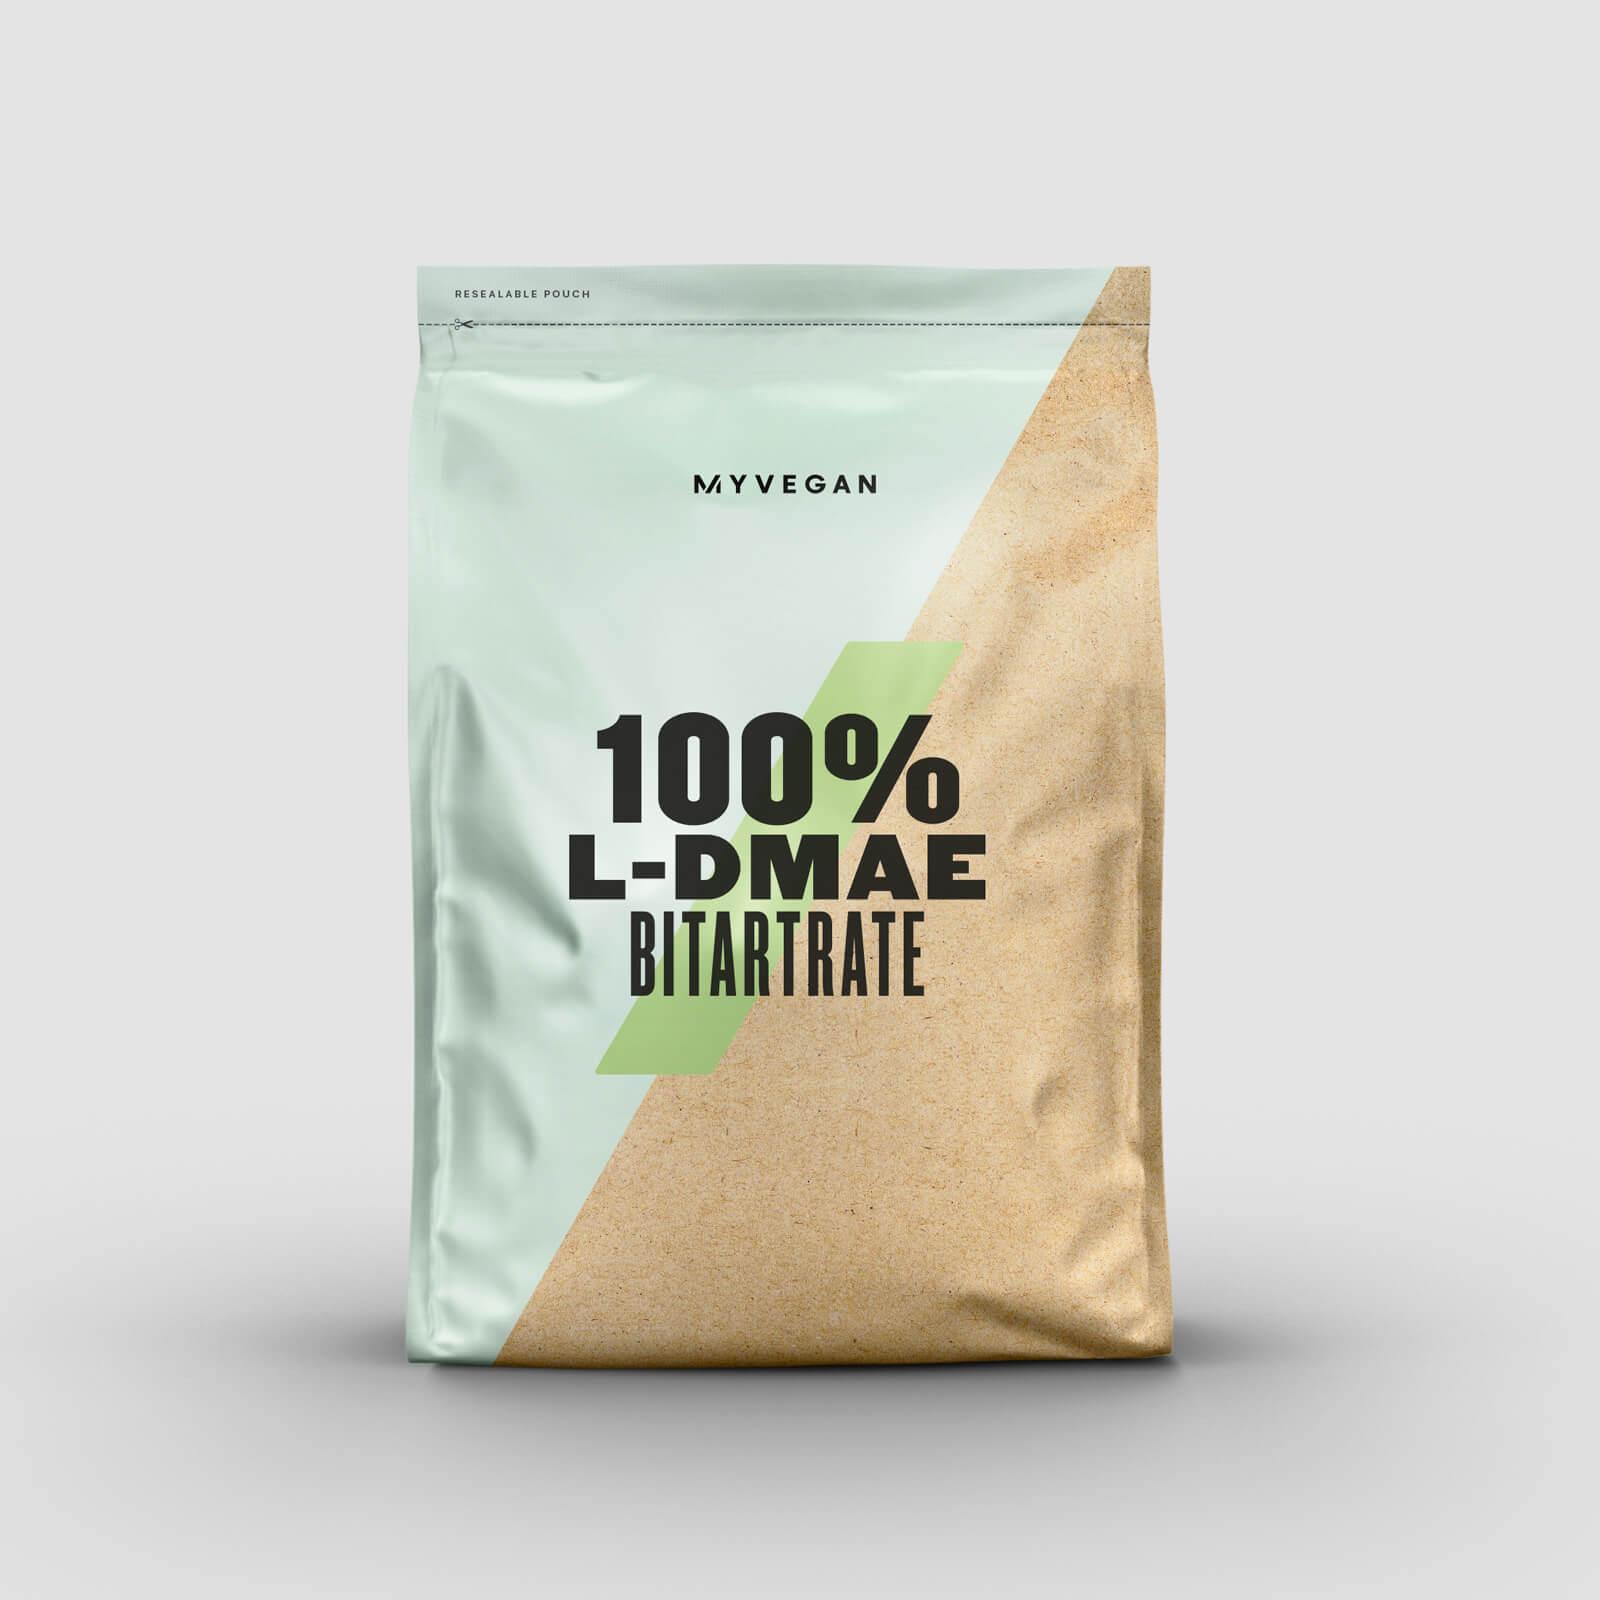 Купить 100% L-DMAE битартрат - 100g - Натуральный вкус, Myprotein International